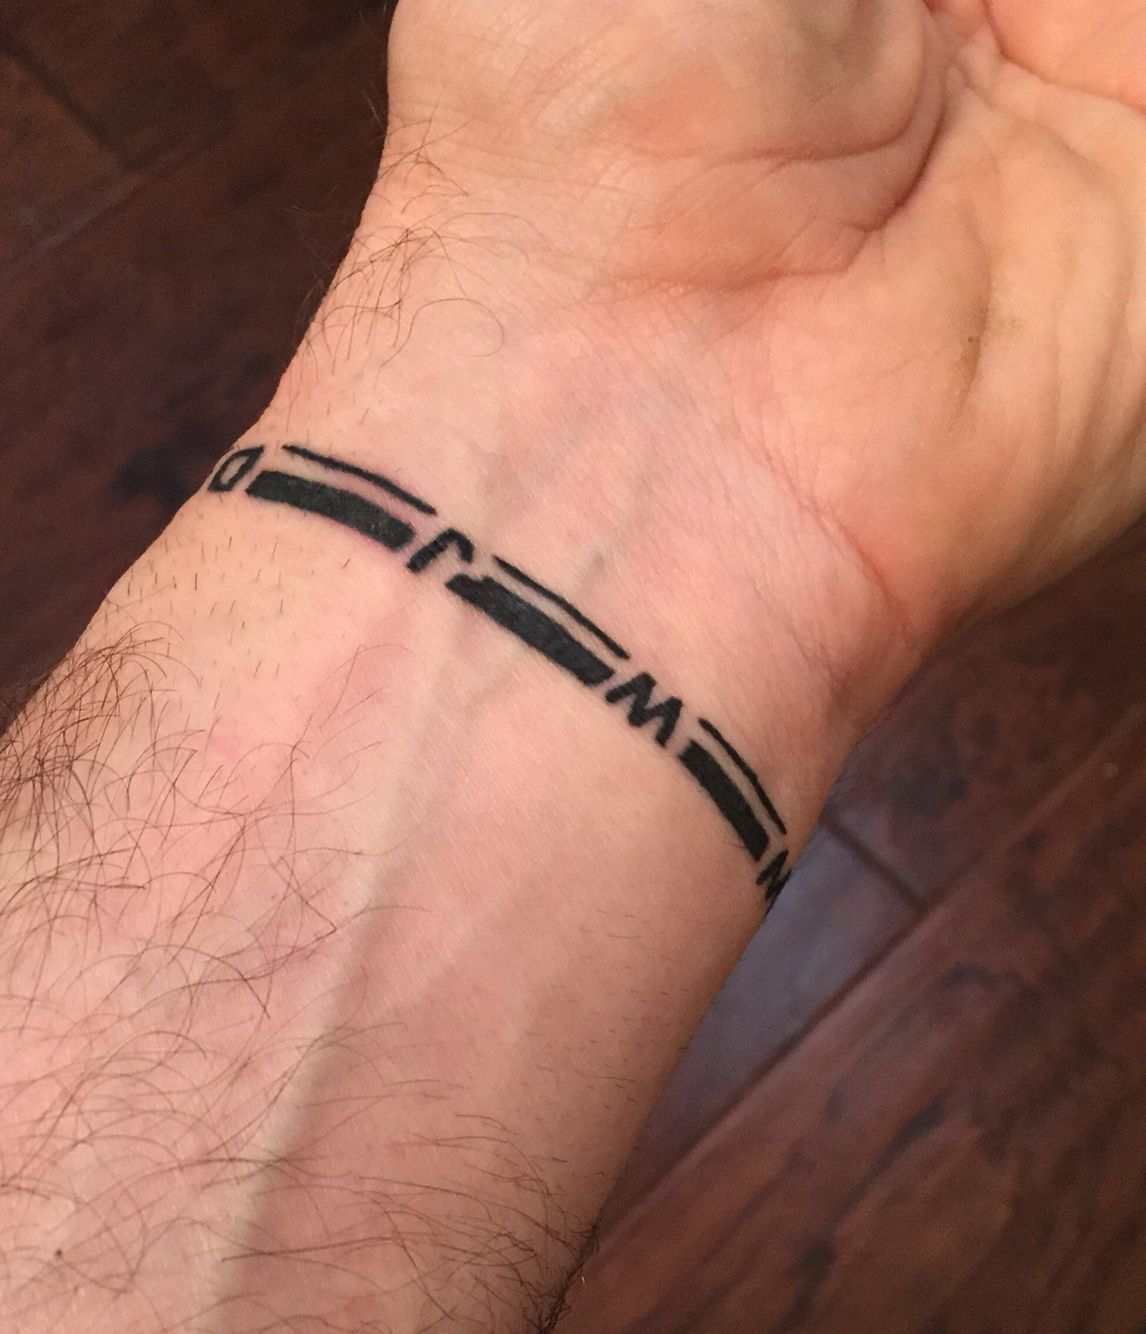 Cross Bracelet Tattoo Bottom Wwjd Tattoo Tattoo Bracelet Chain pertaining to proportions 1146 X 1334